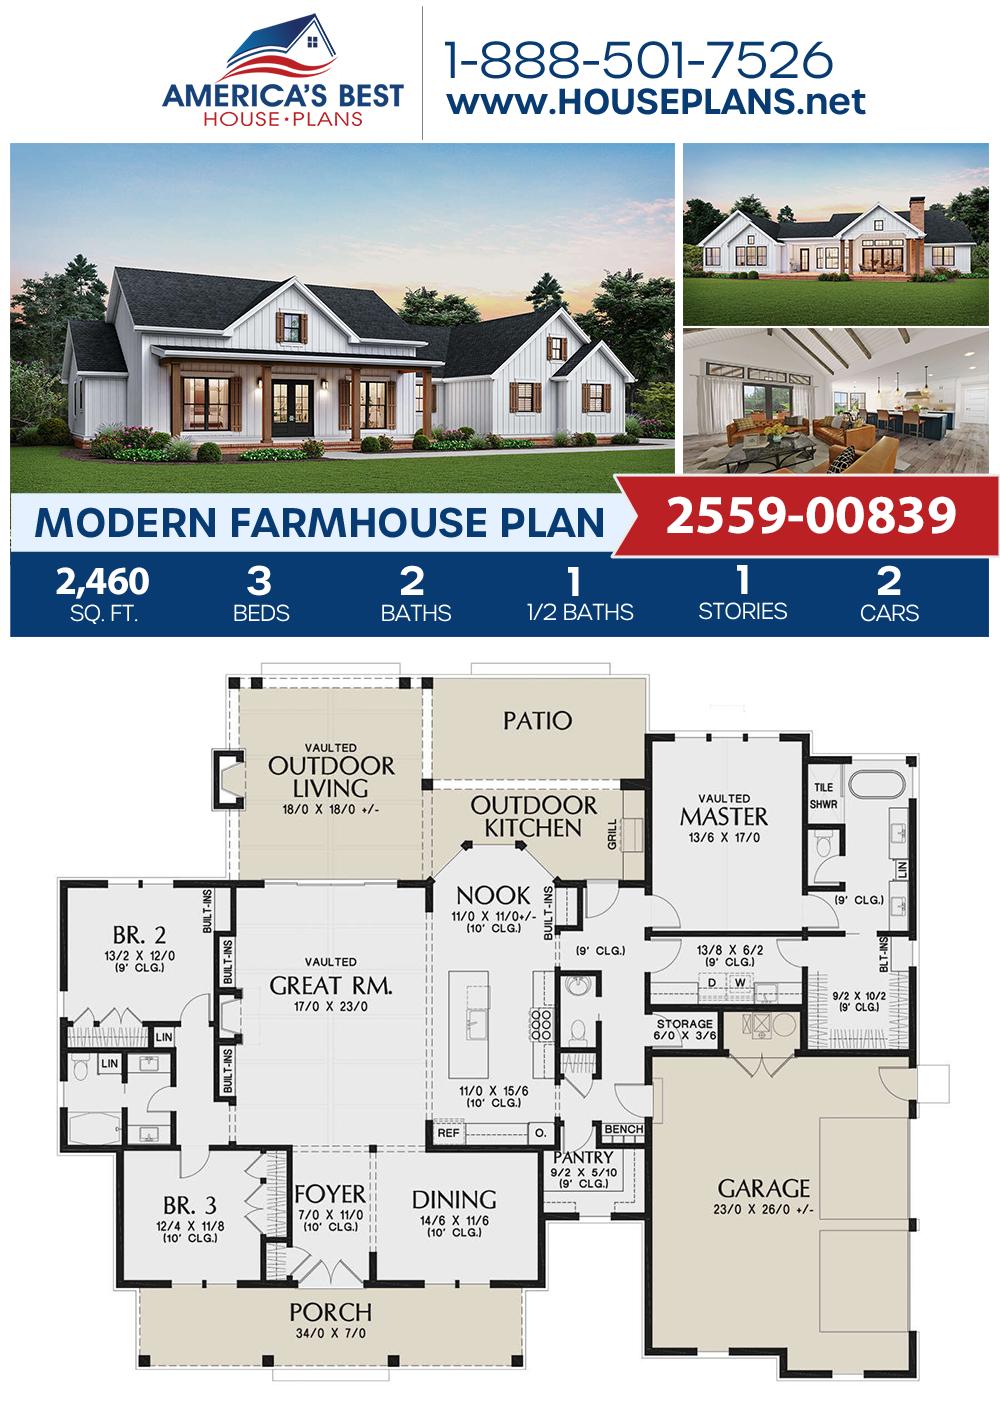 House Plan 2559 00839 Modern Farmhouse Plan 2 460 Square Feet 3 Bedrooms 2 5 Bathrooms Modern Farmhouse Plans Building Plans House Farmhouse Plans